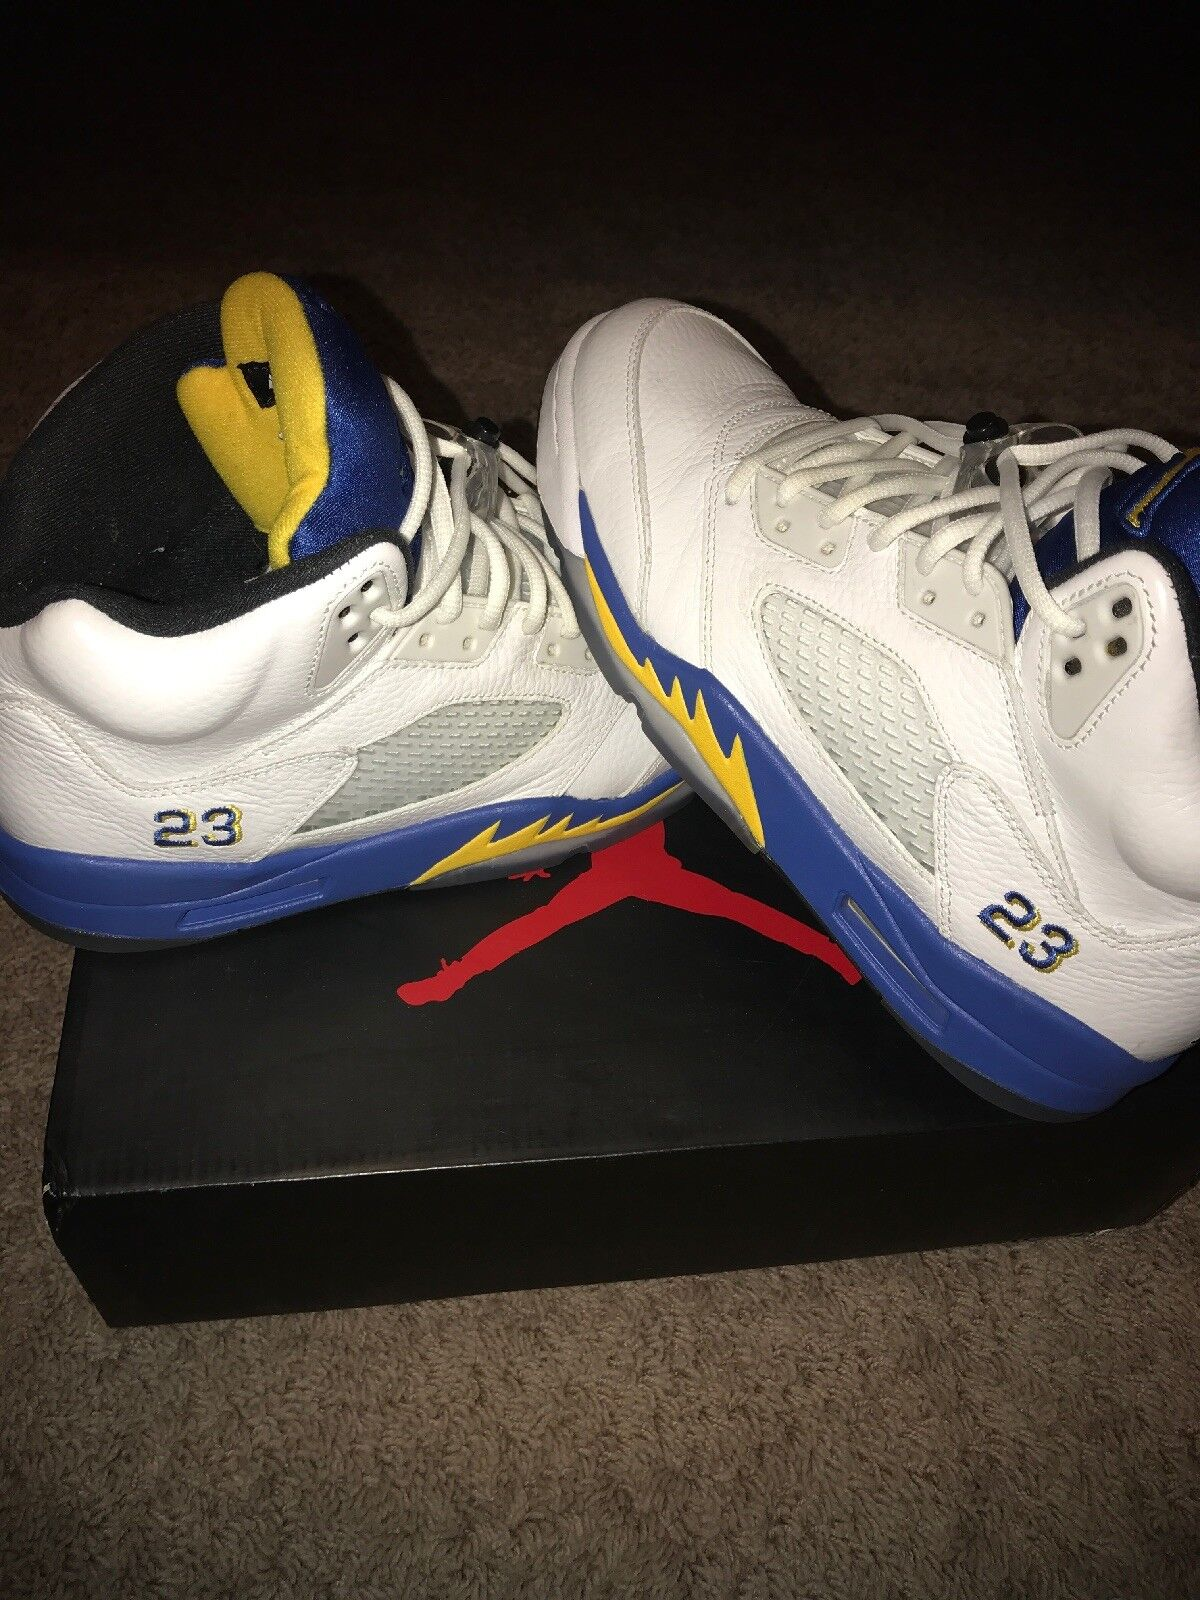 "Retro Jordan Size 9.5 ""Laney"" NEW"